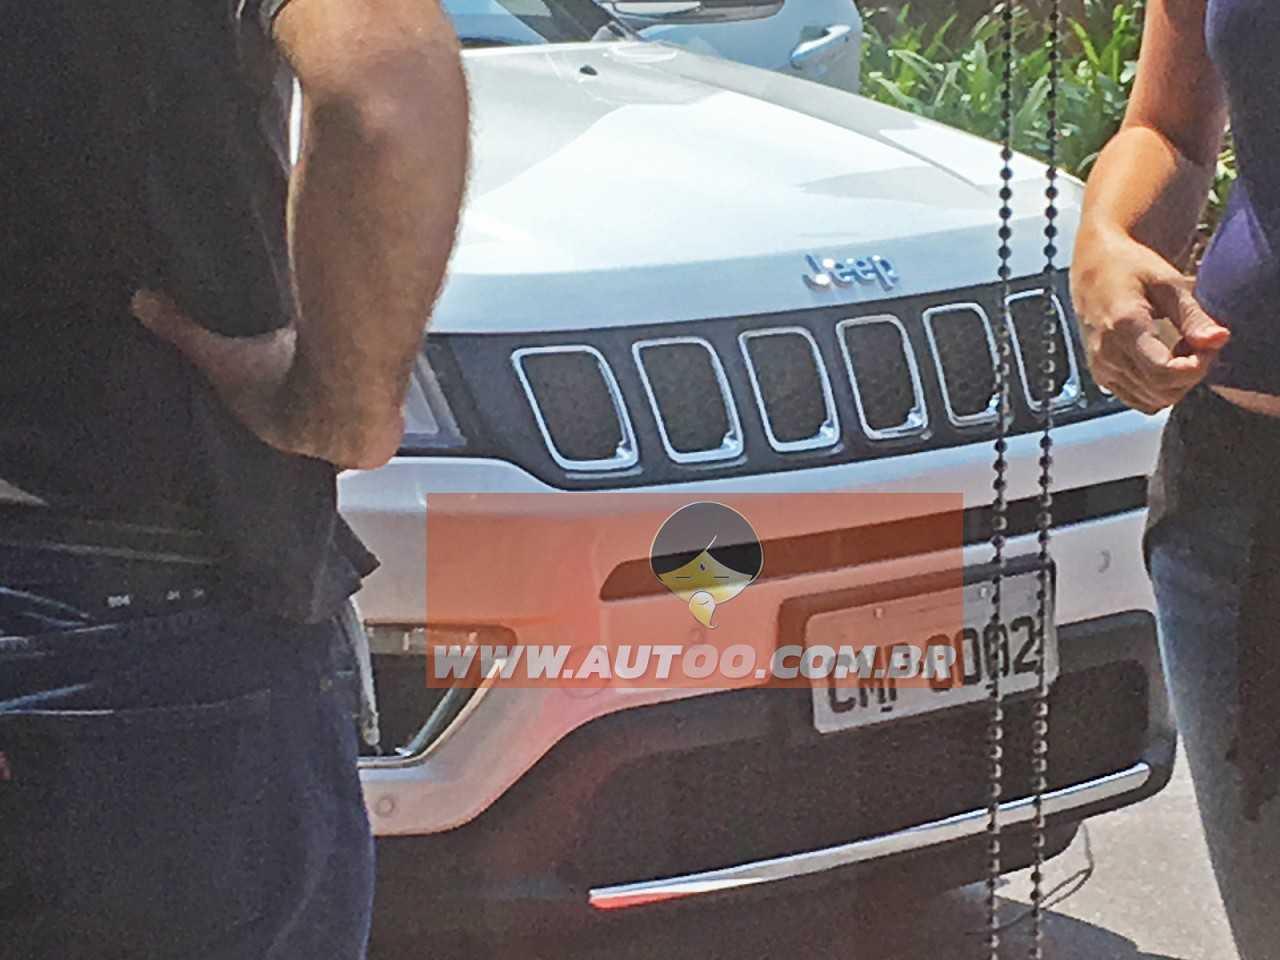 JeepCompass 2017 - grade frontal